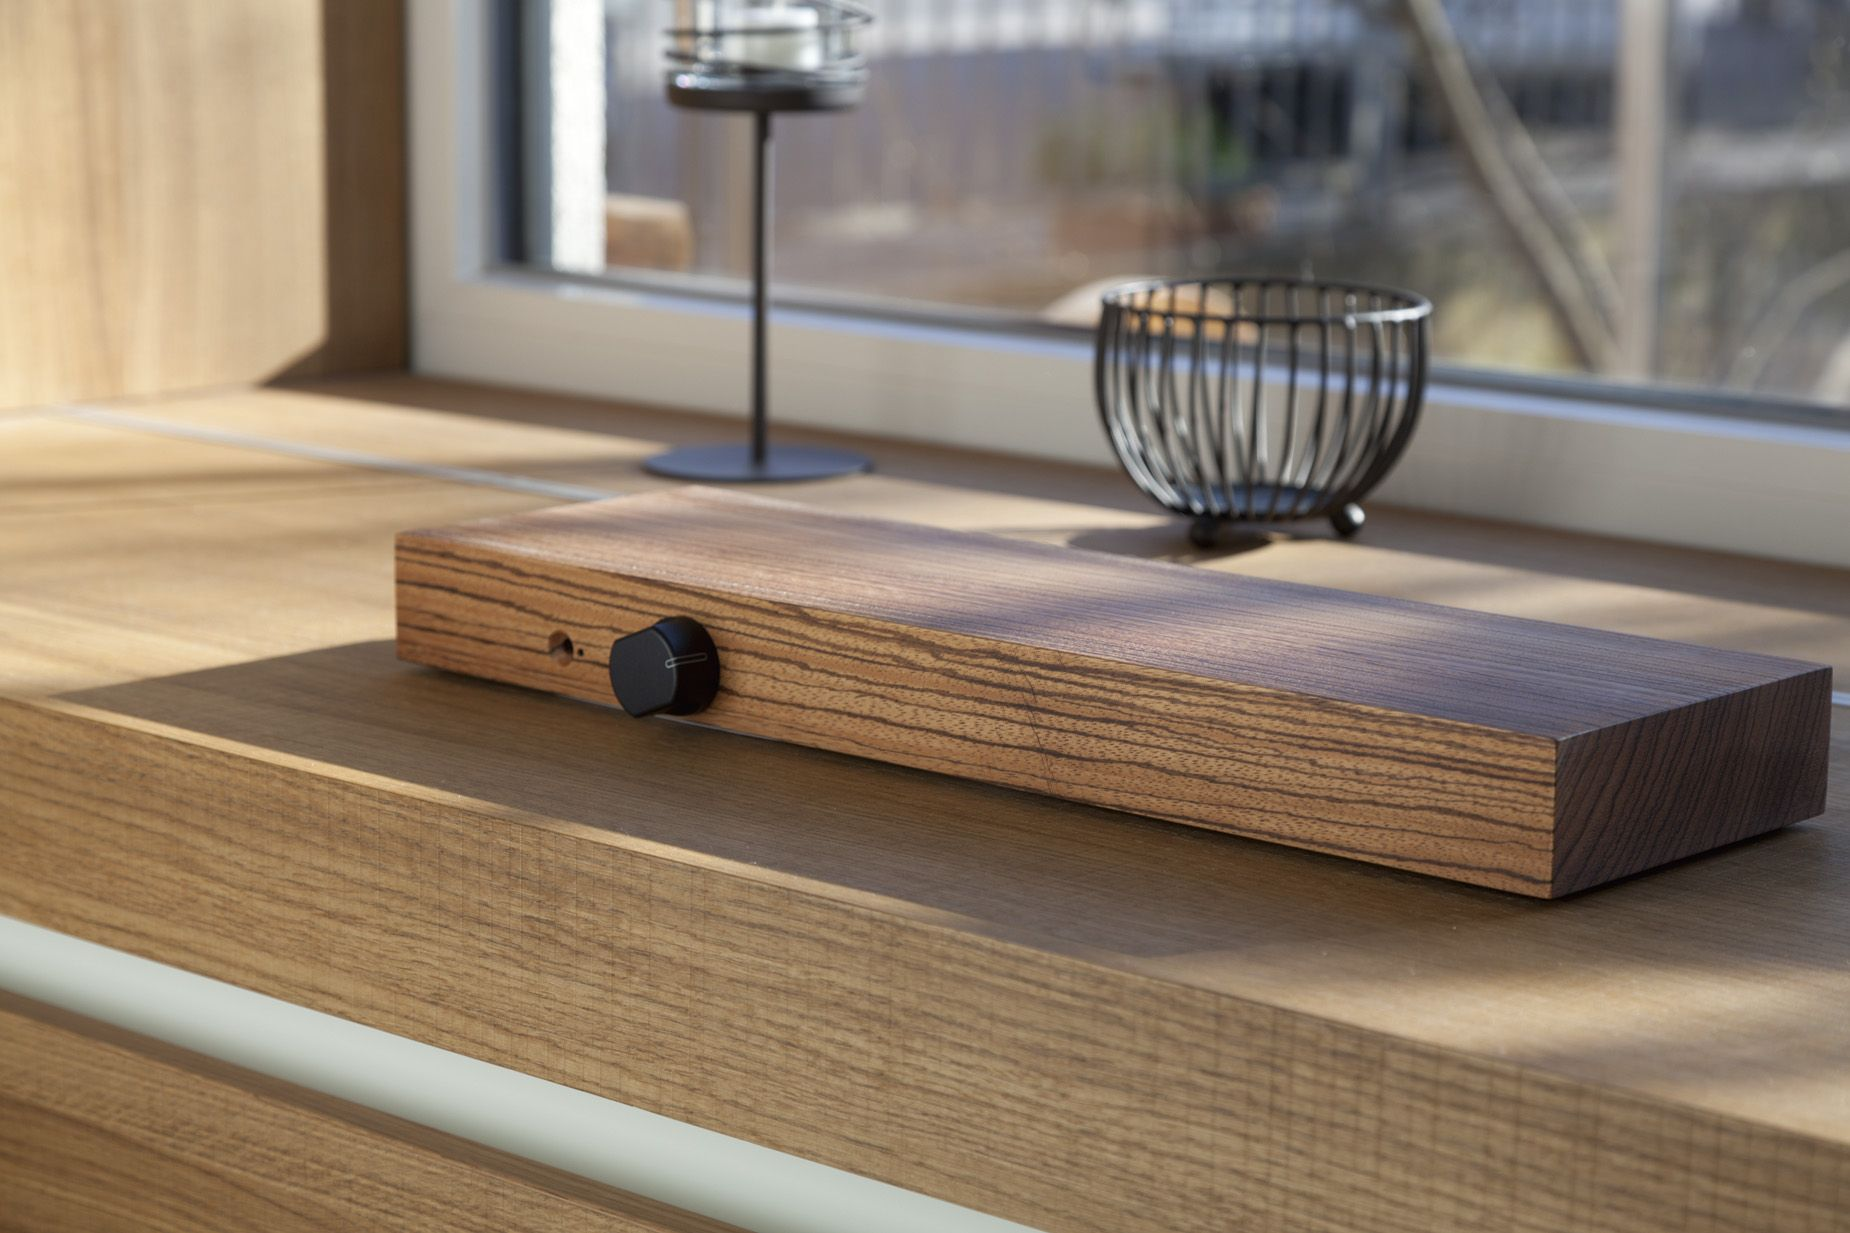 Soundmobel Sound Mobel Mobel Mit Lautsprechern Lautsprecher In Mobel Integriert Sqaure Sound Design Lautsprecher Kuchenunterschrank Ikea Unterschrank Kuche